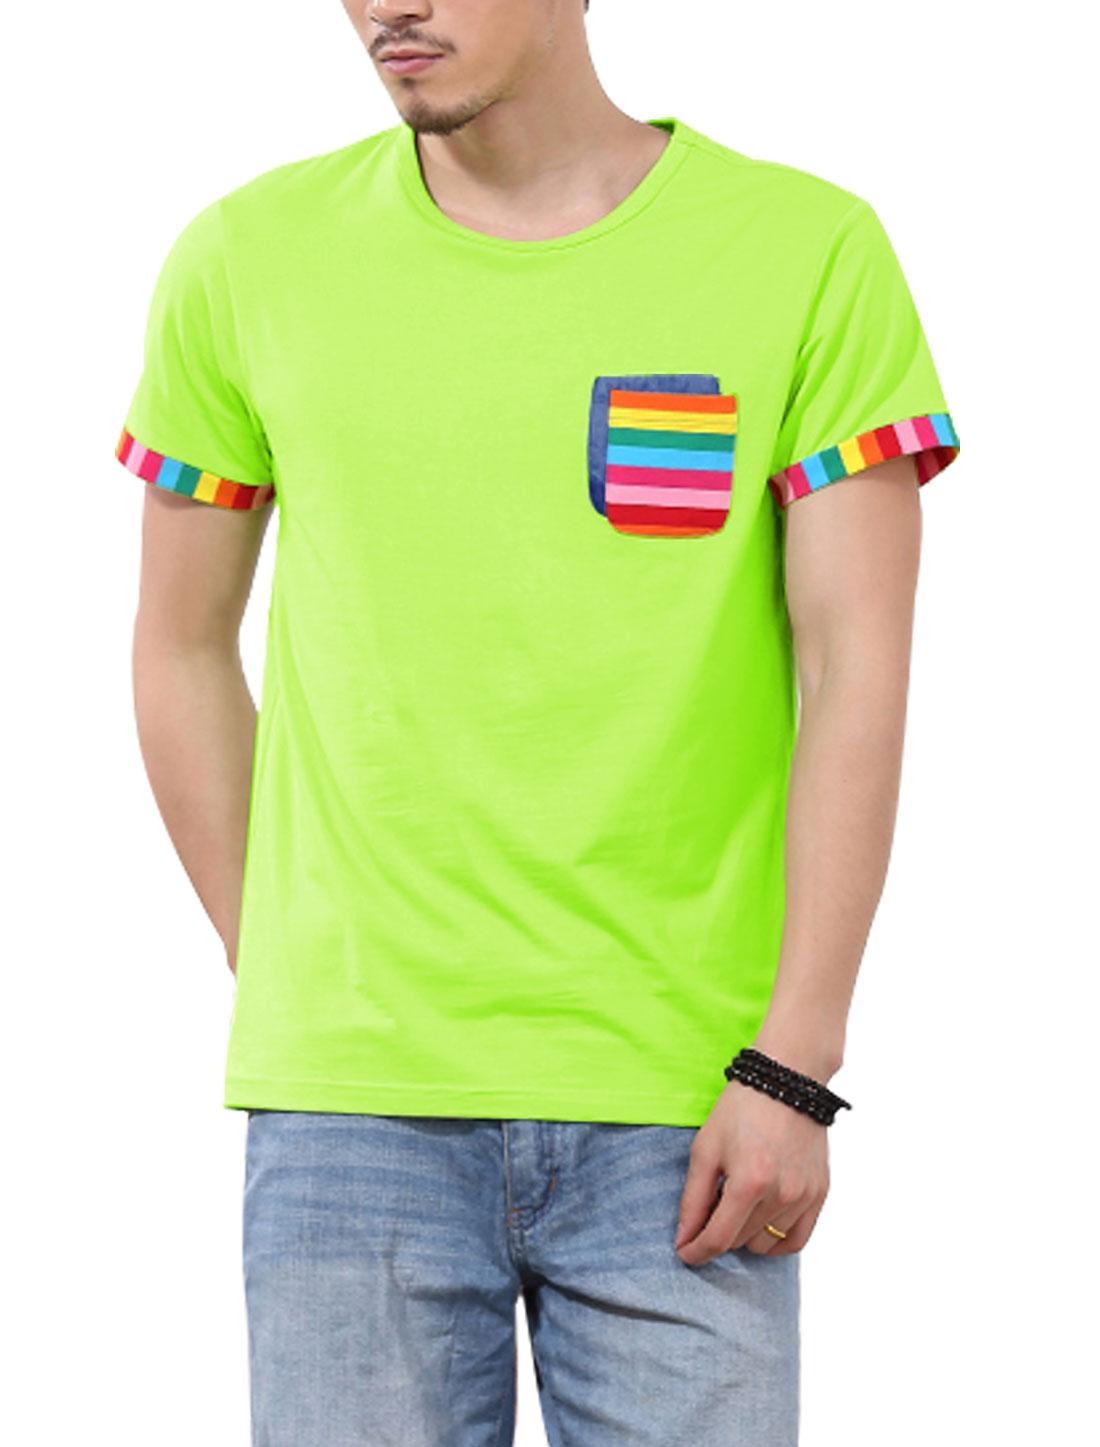 Men Short Sleeve Pullover Chest Pockets Fashion Top Light Green M